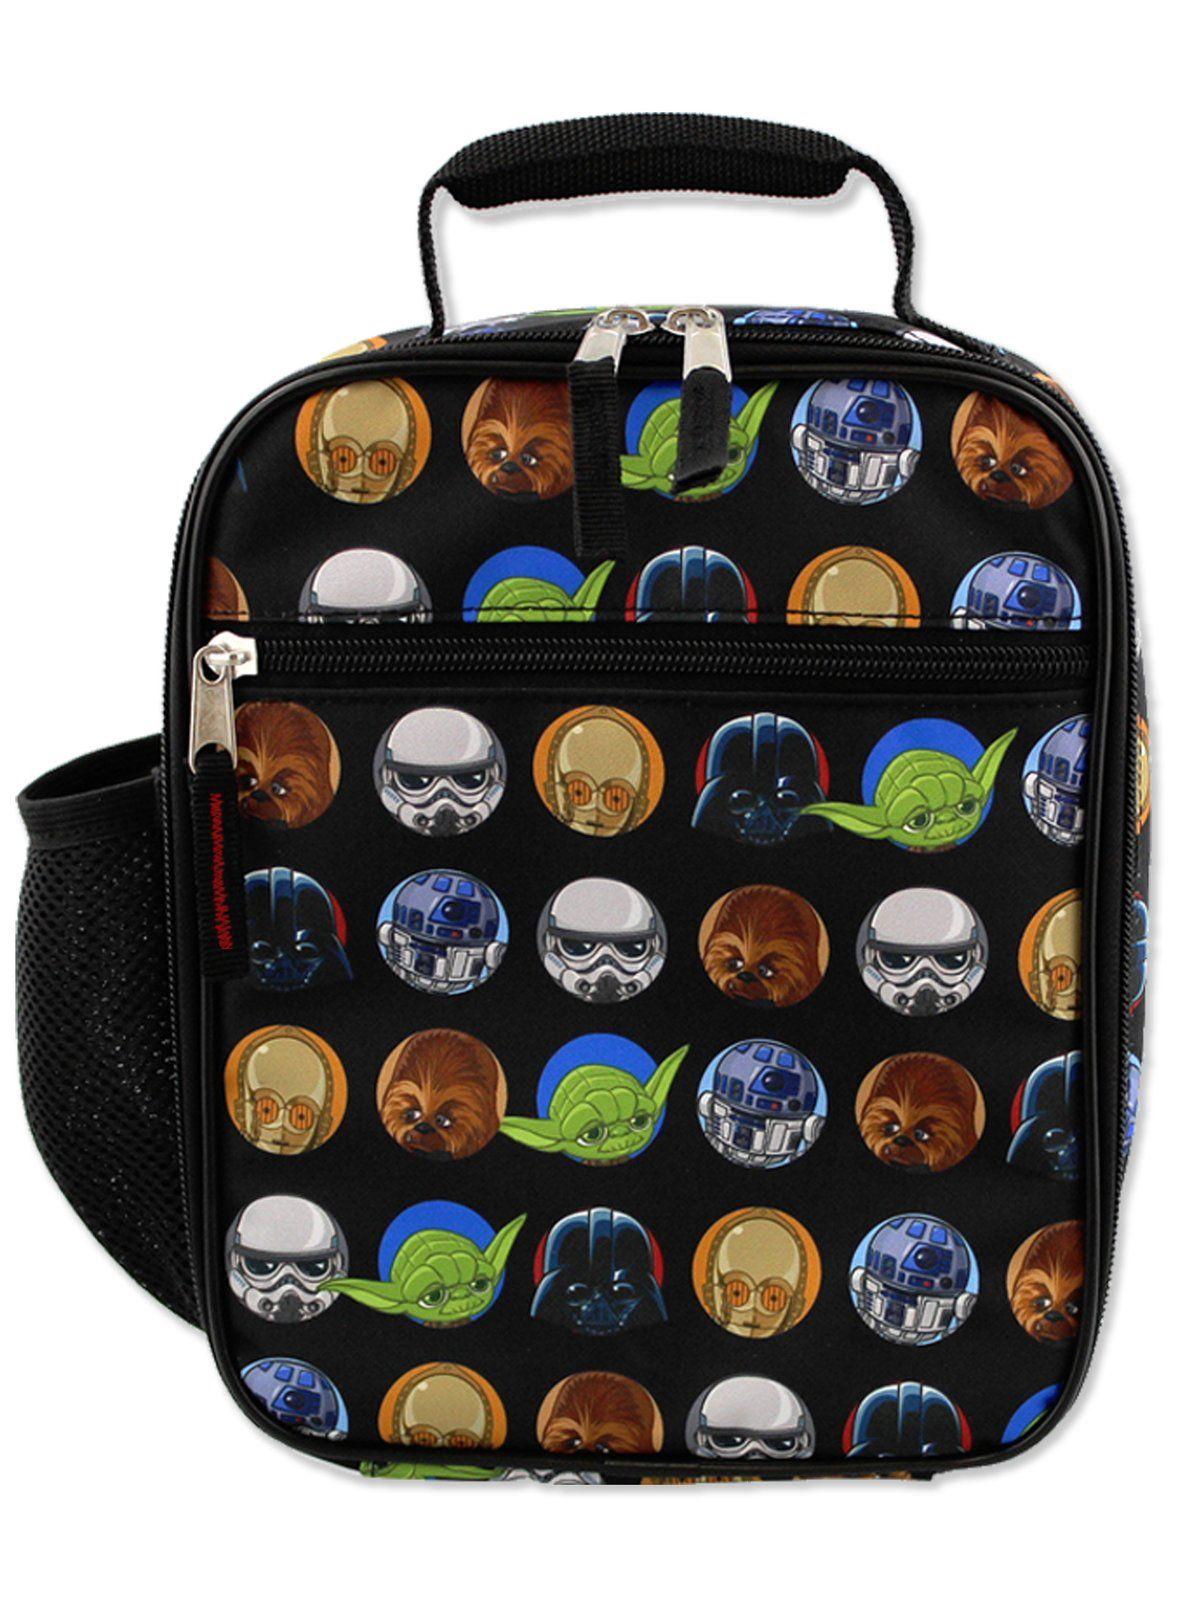 "Star Wars Darth Vader Toy Bag Clip Key Chains Coin Bag Clip On 8/"" Soft Plush"